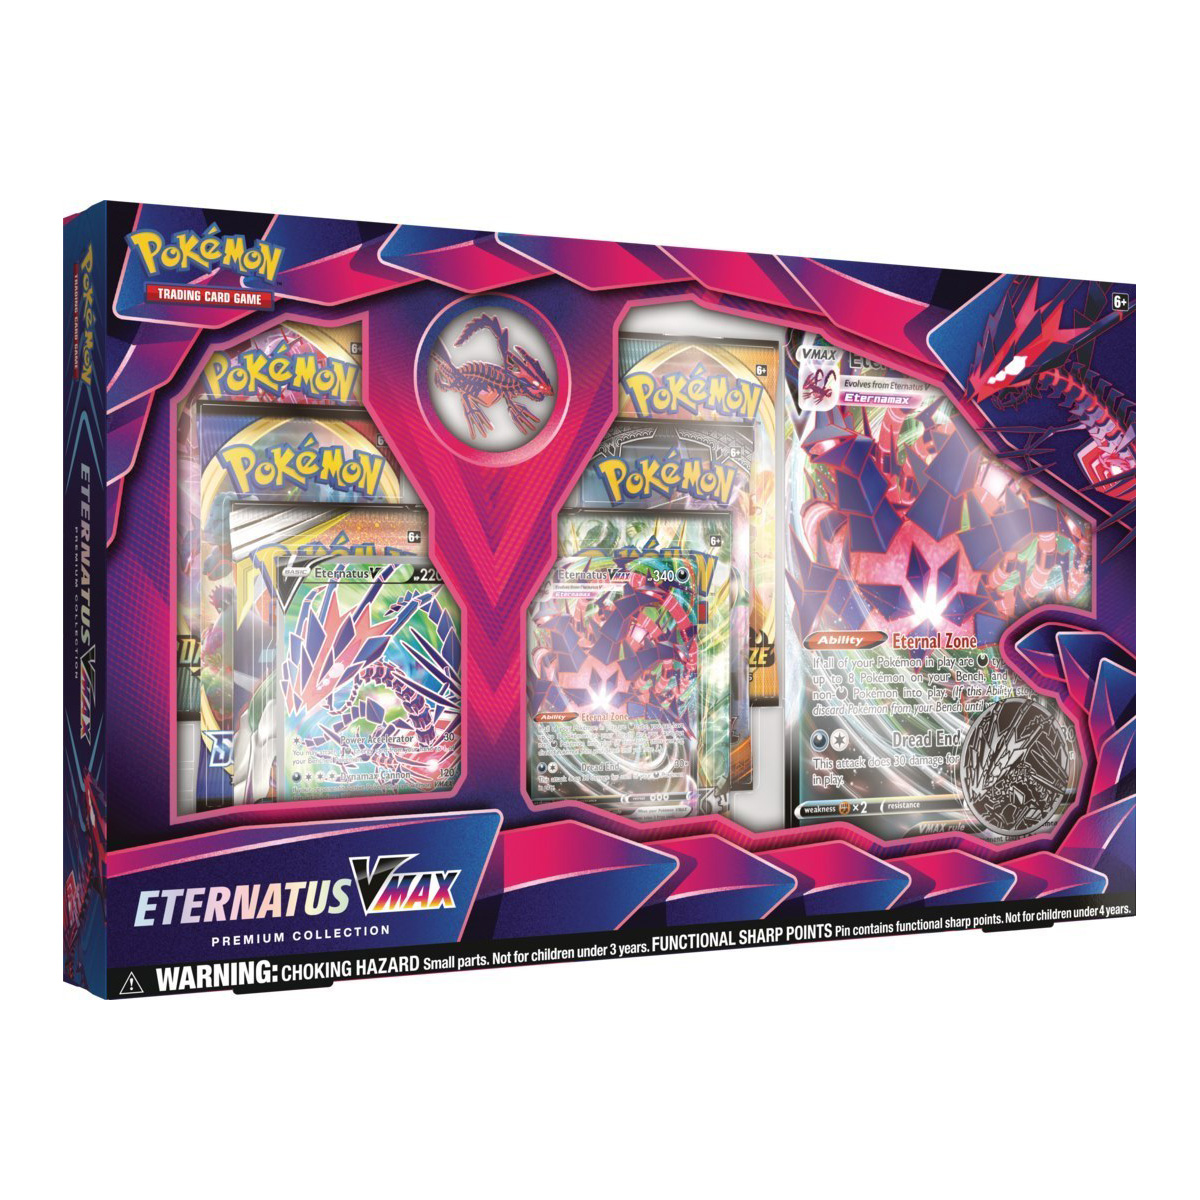 Pokemon Eternatus VMAX Premium Box CollectionTrading Card Game Boosters Promo